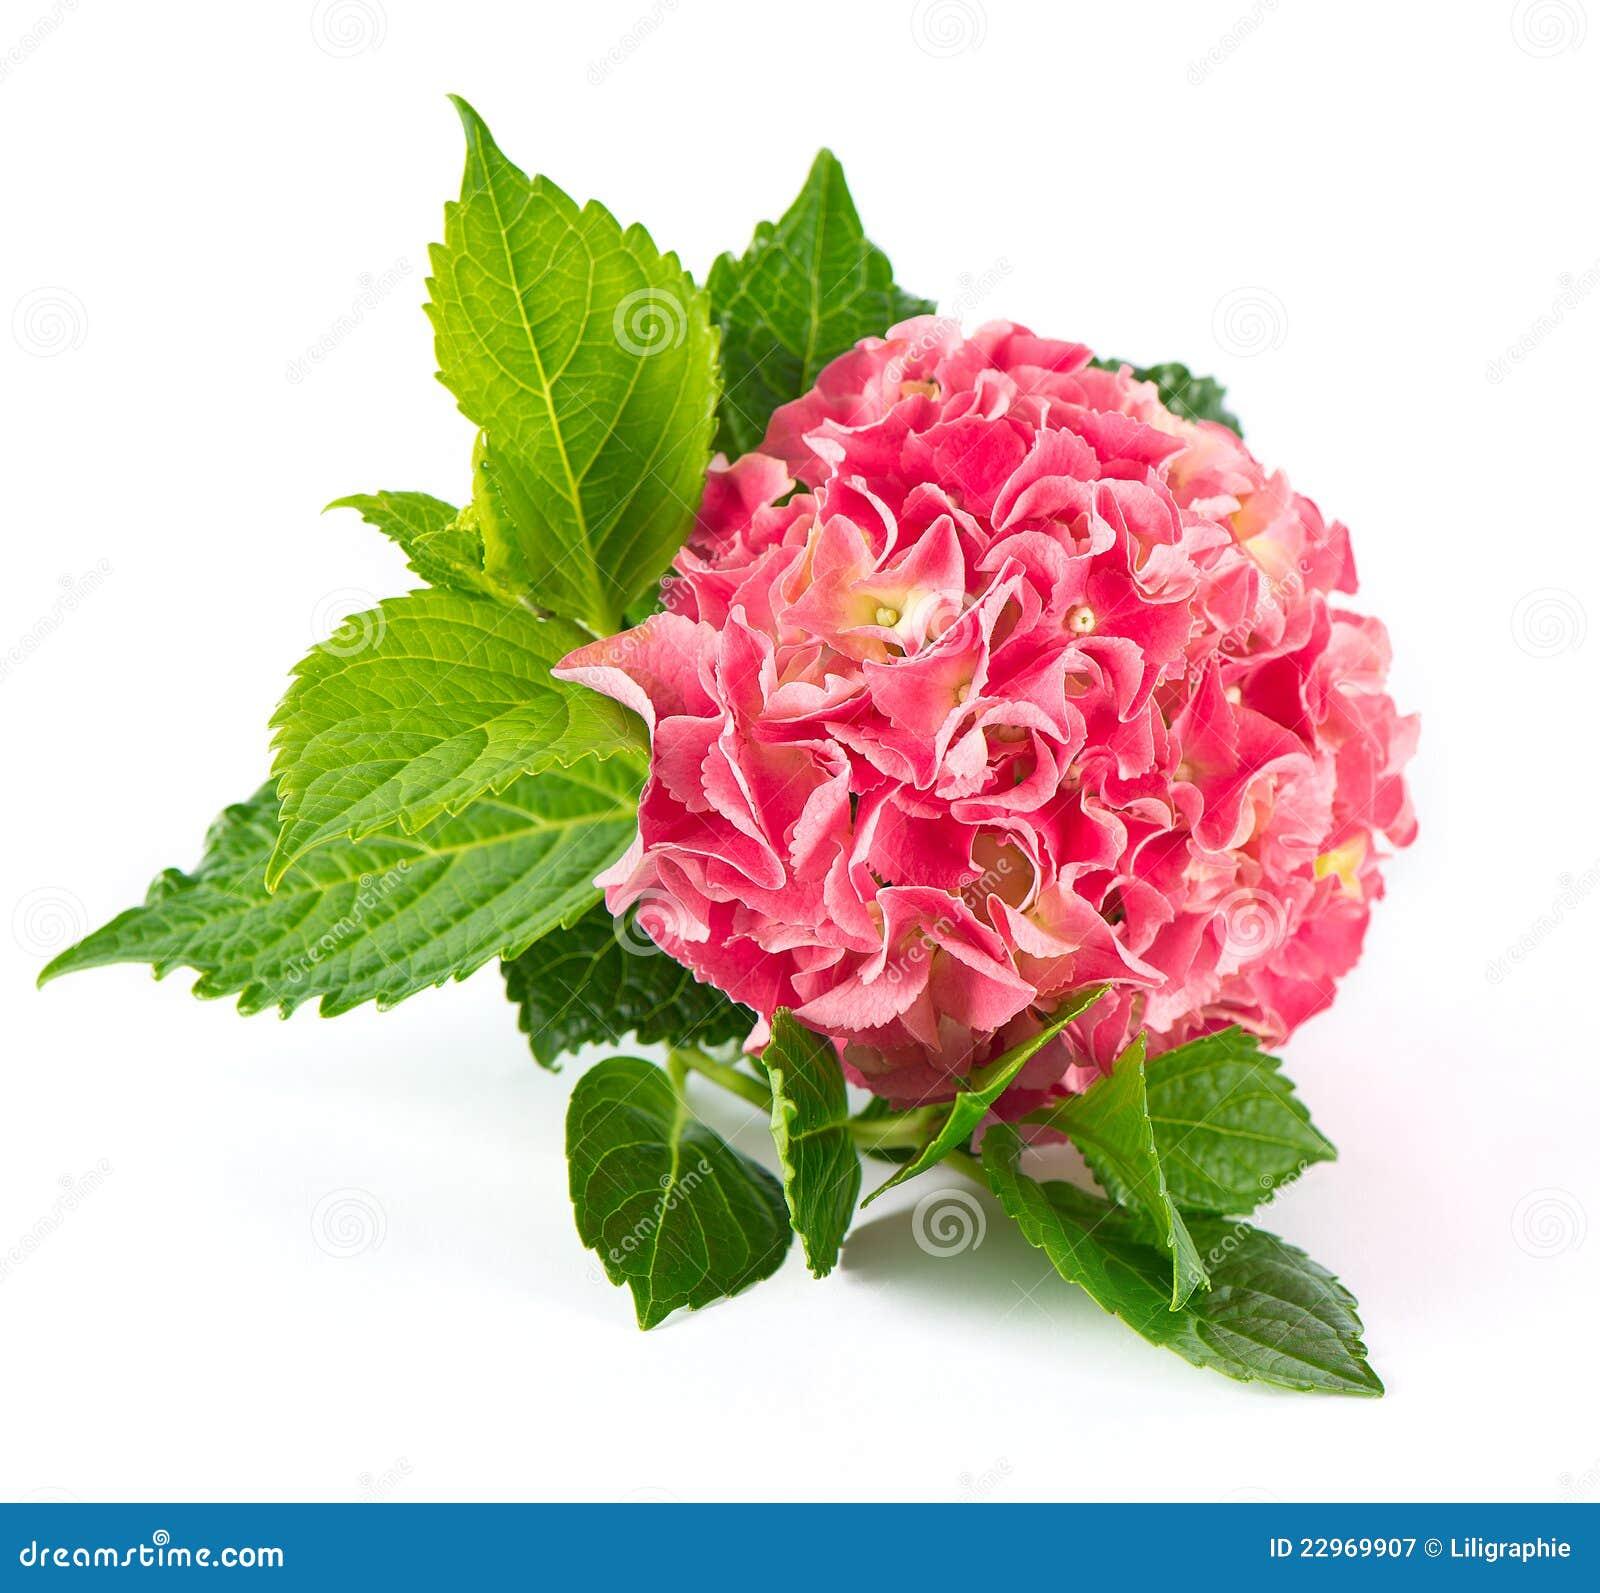 pink hortensia blossom fresh hydrangea flower royalty hydrangea clip art images hydrangea clip art free images